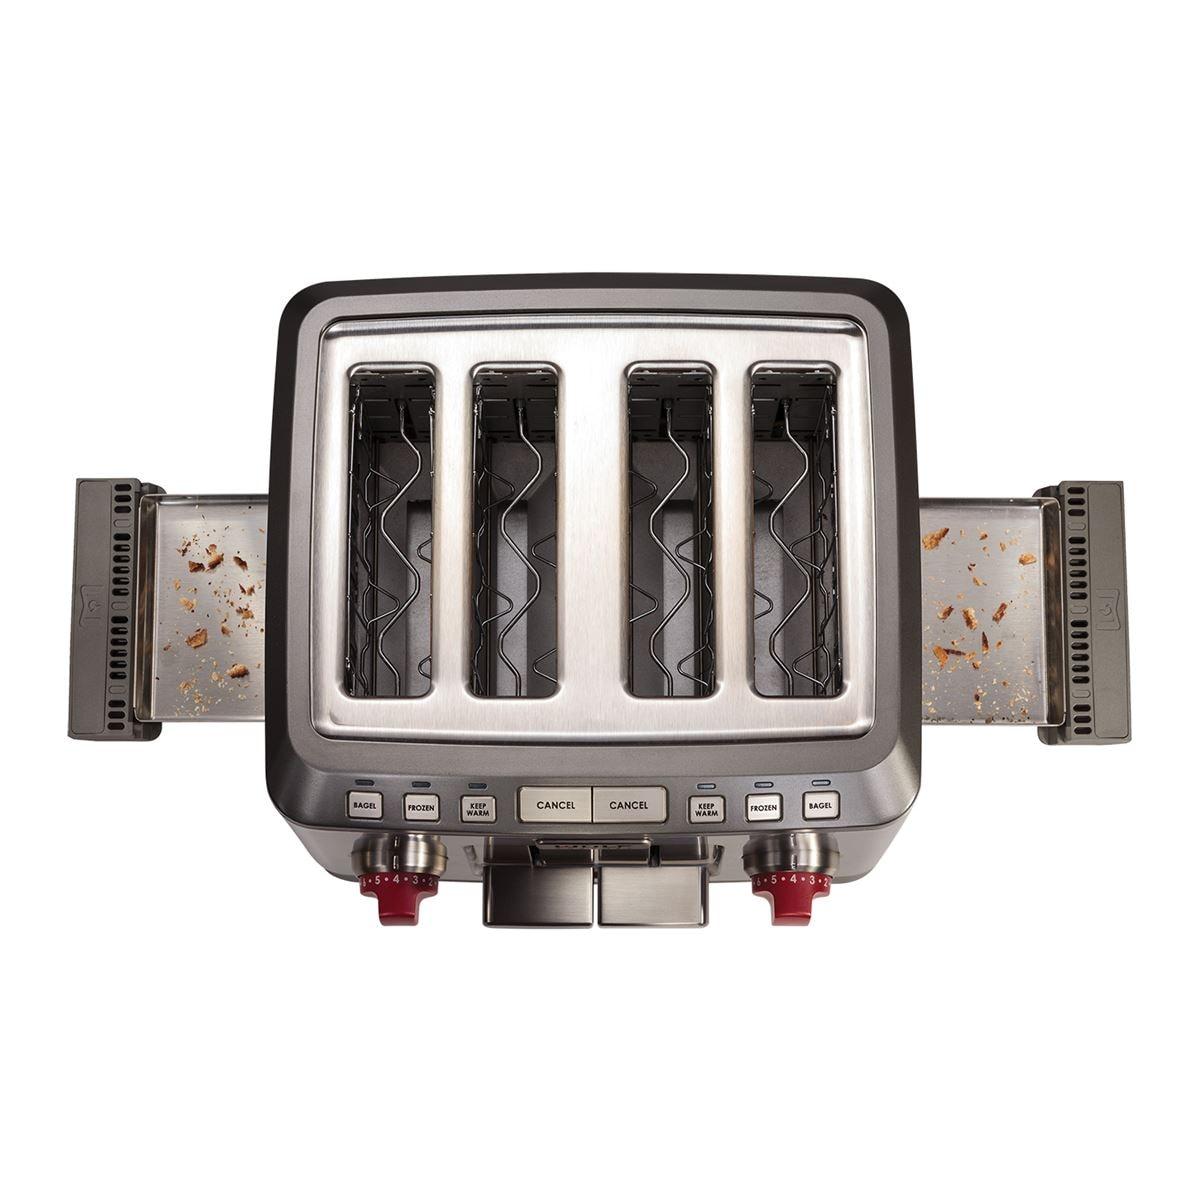 Countertop Dishwasher Future Shop : Four Slice Toaster